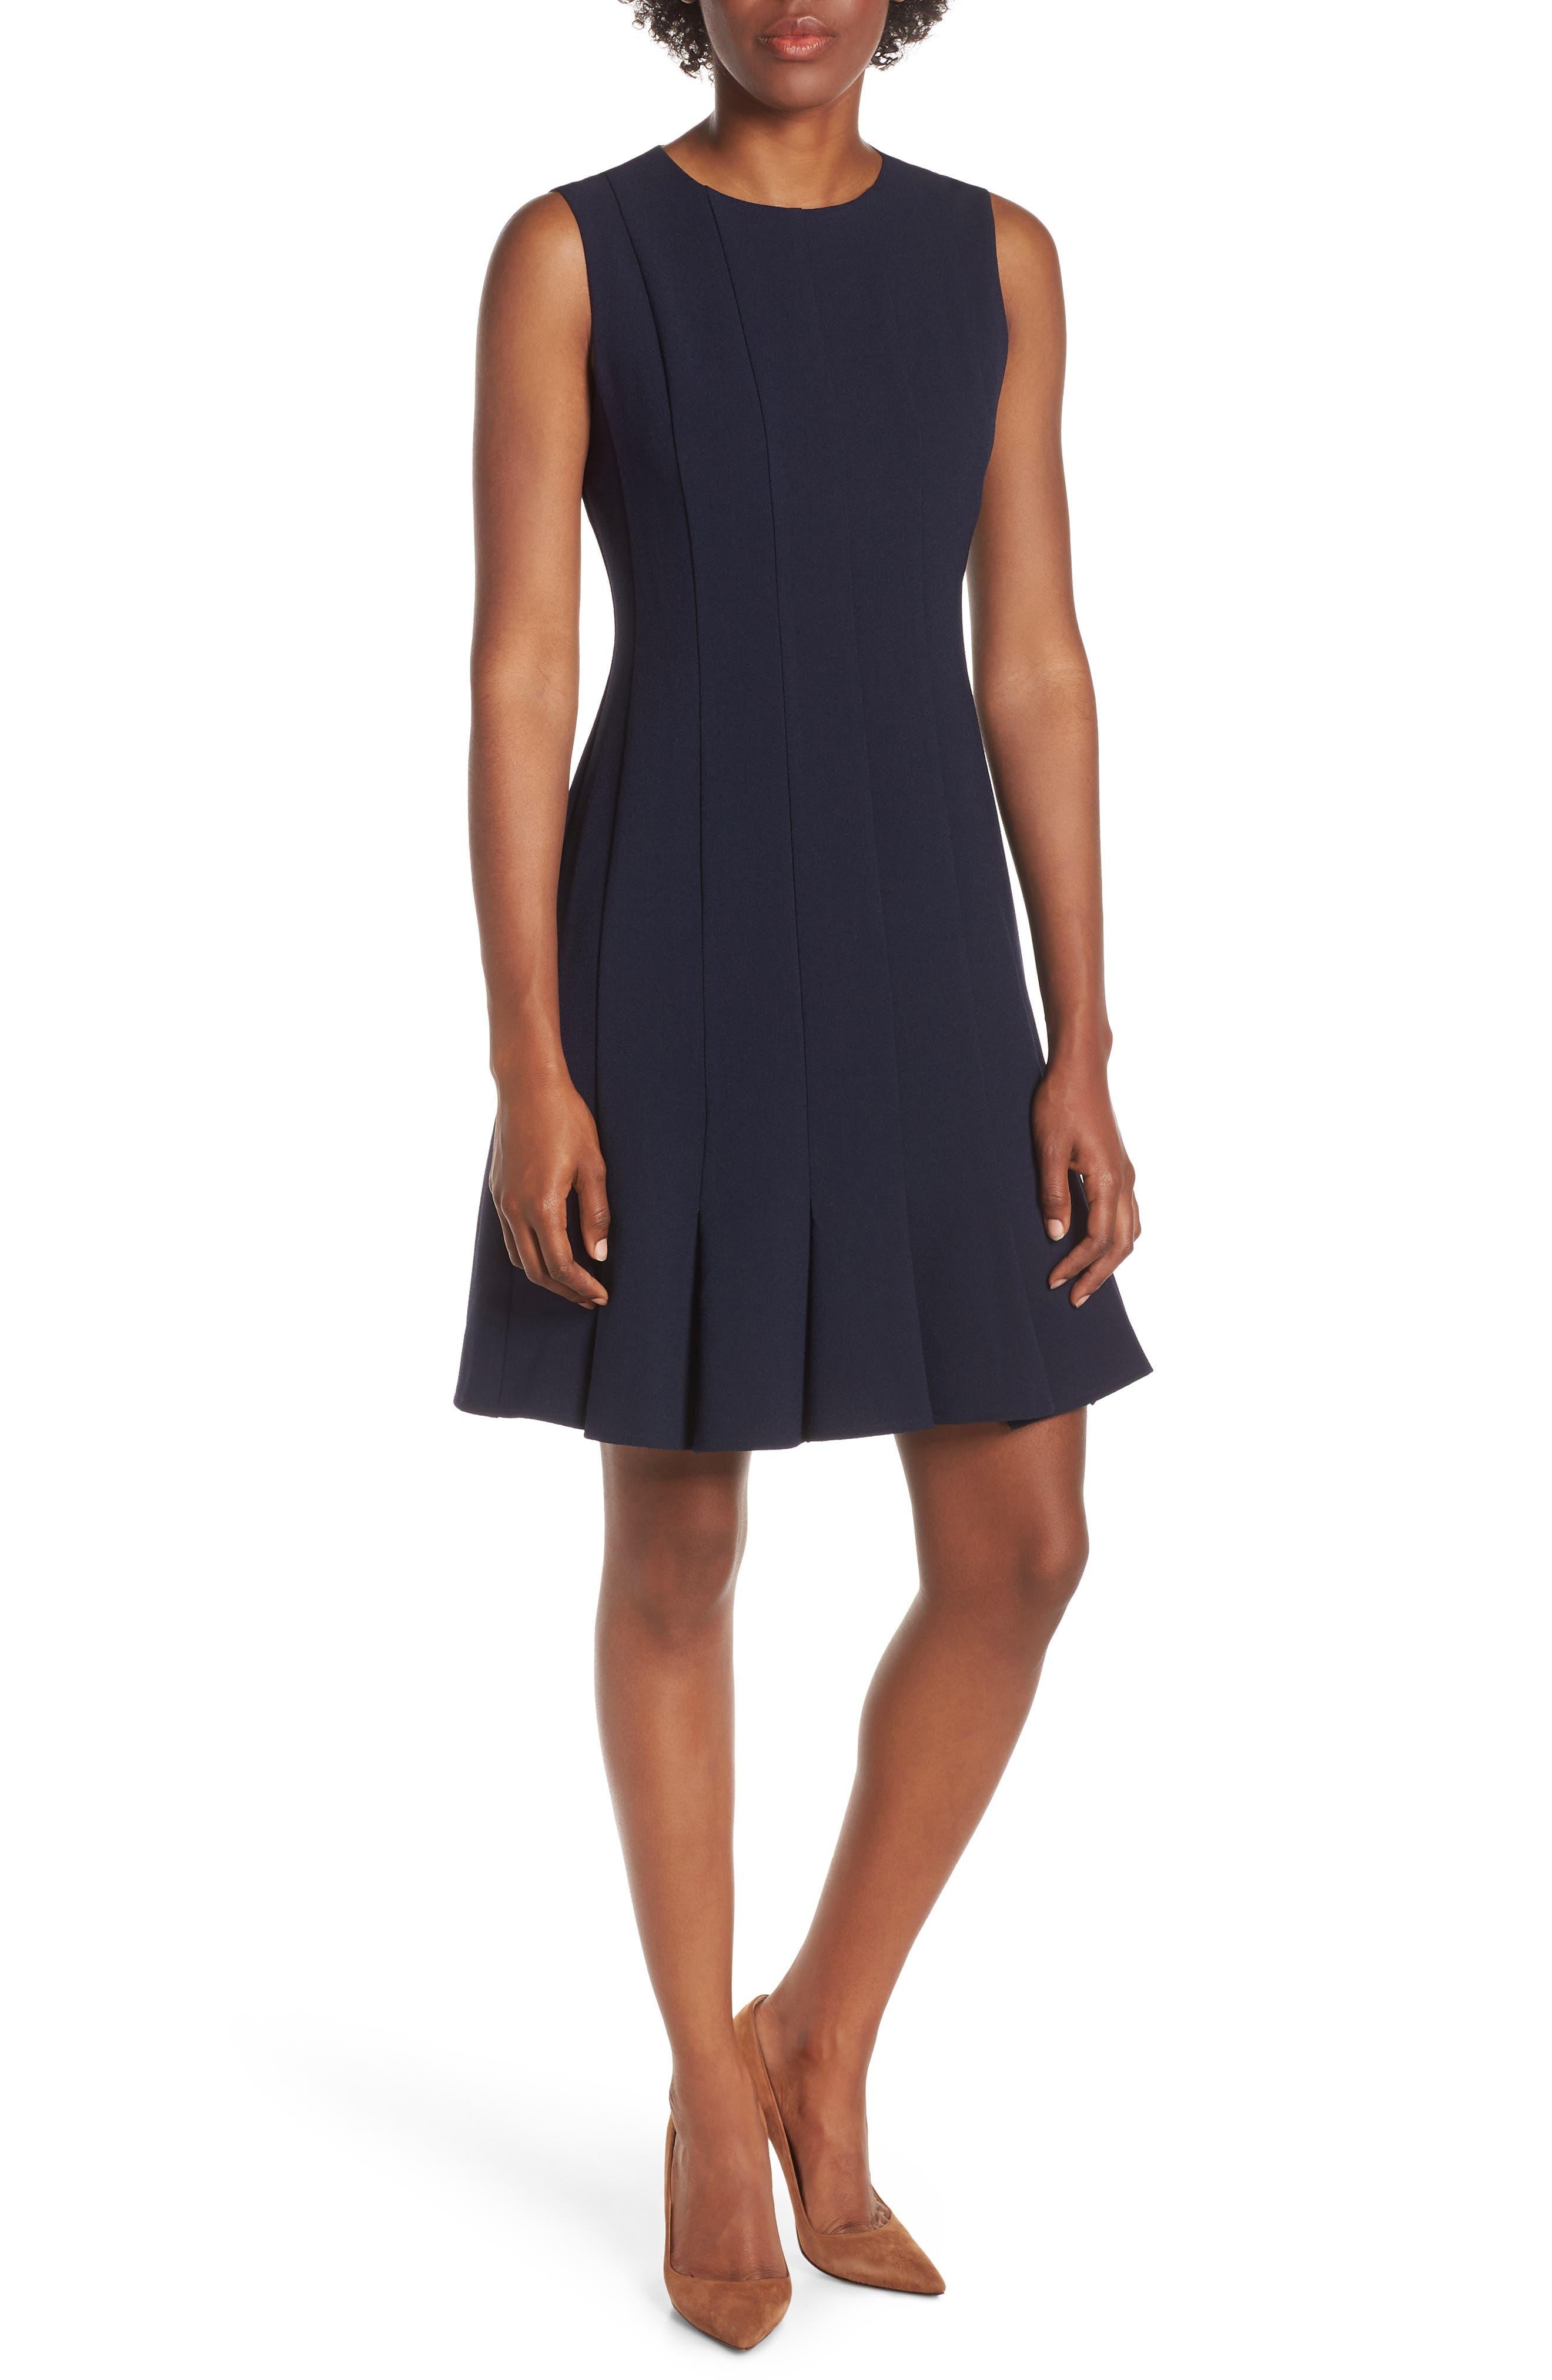 JULIA JORDAN, Sleeveless Pleat Panel Fit & Flare Dress, Main thumbnail 1, color, NAVY